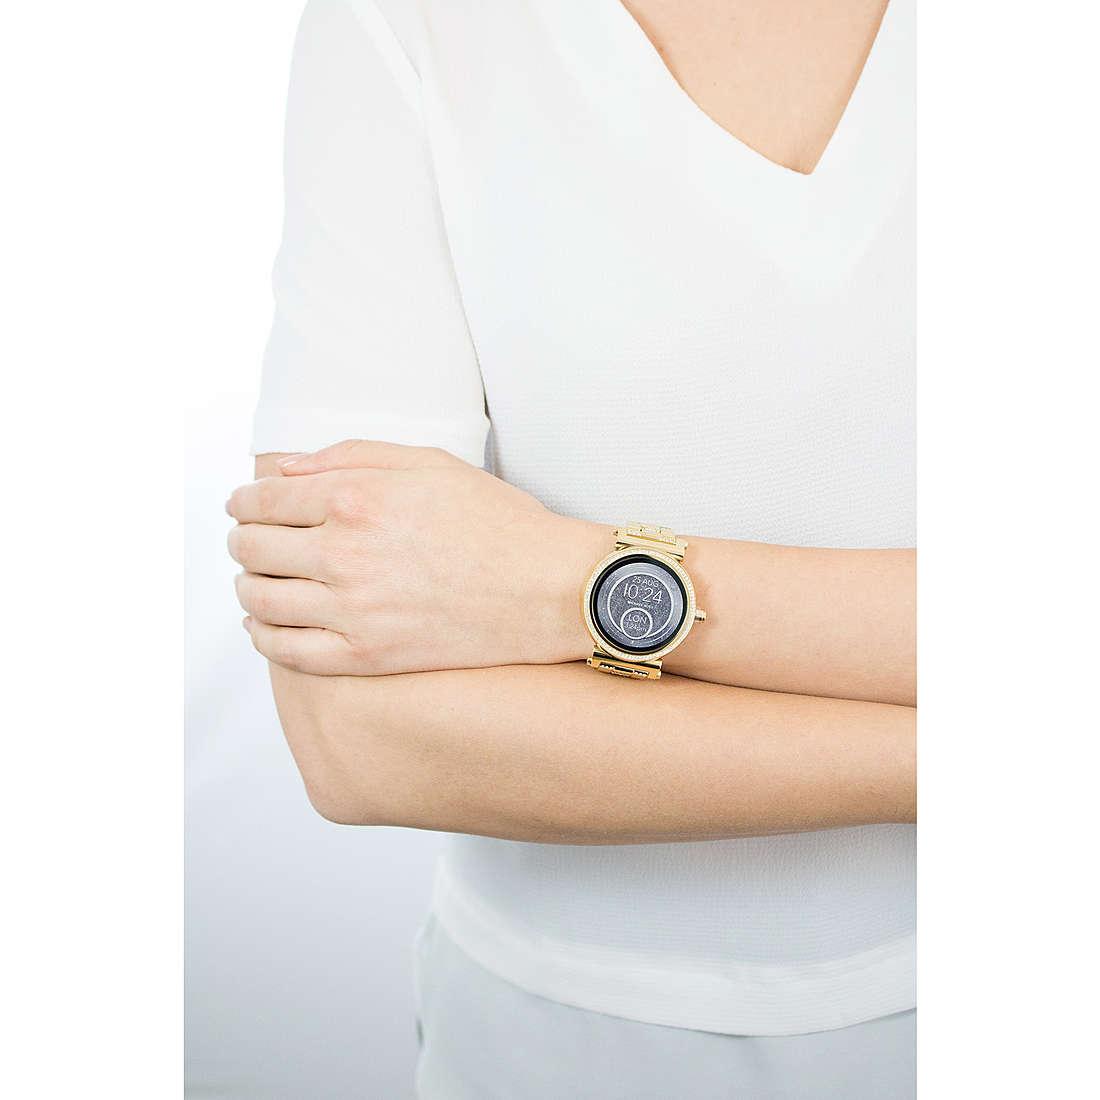 Michael Kors Smartwatches Sofie woman MKT5023 photo wearing